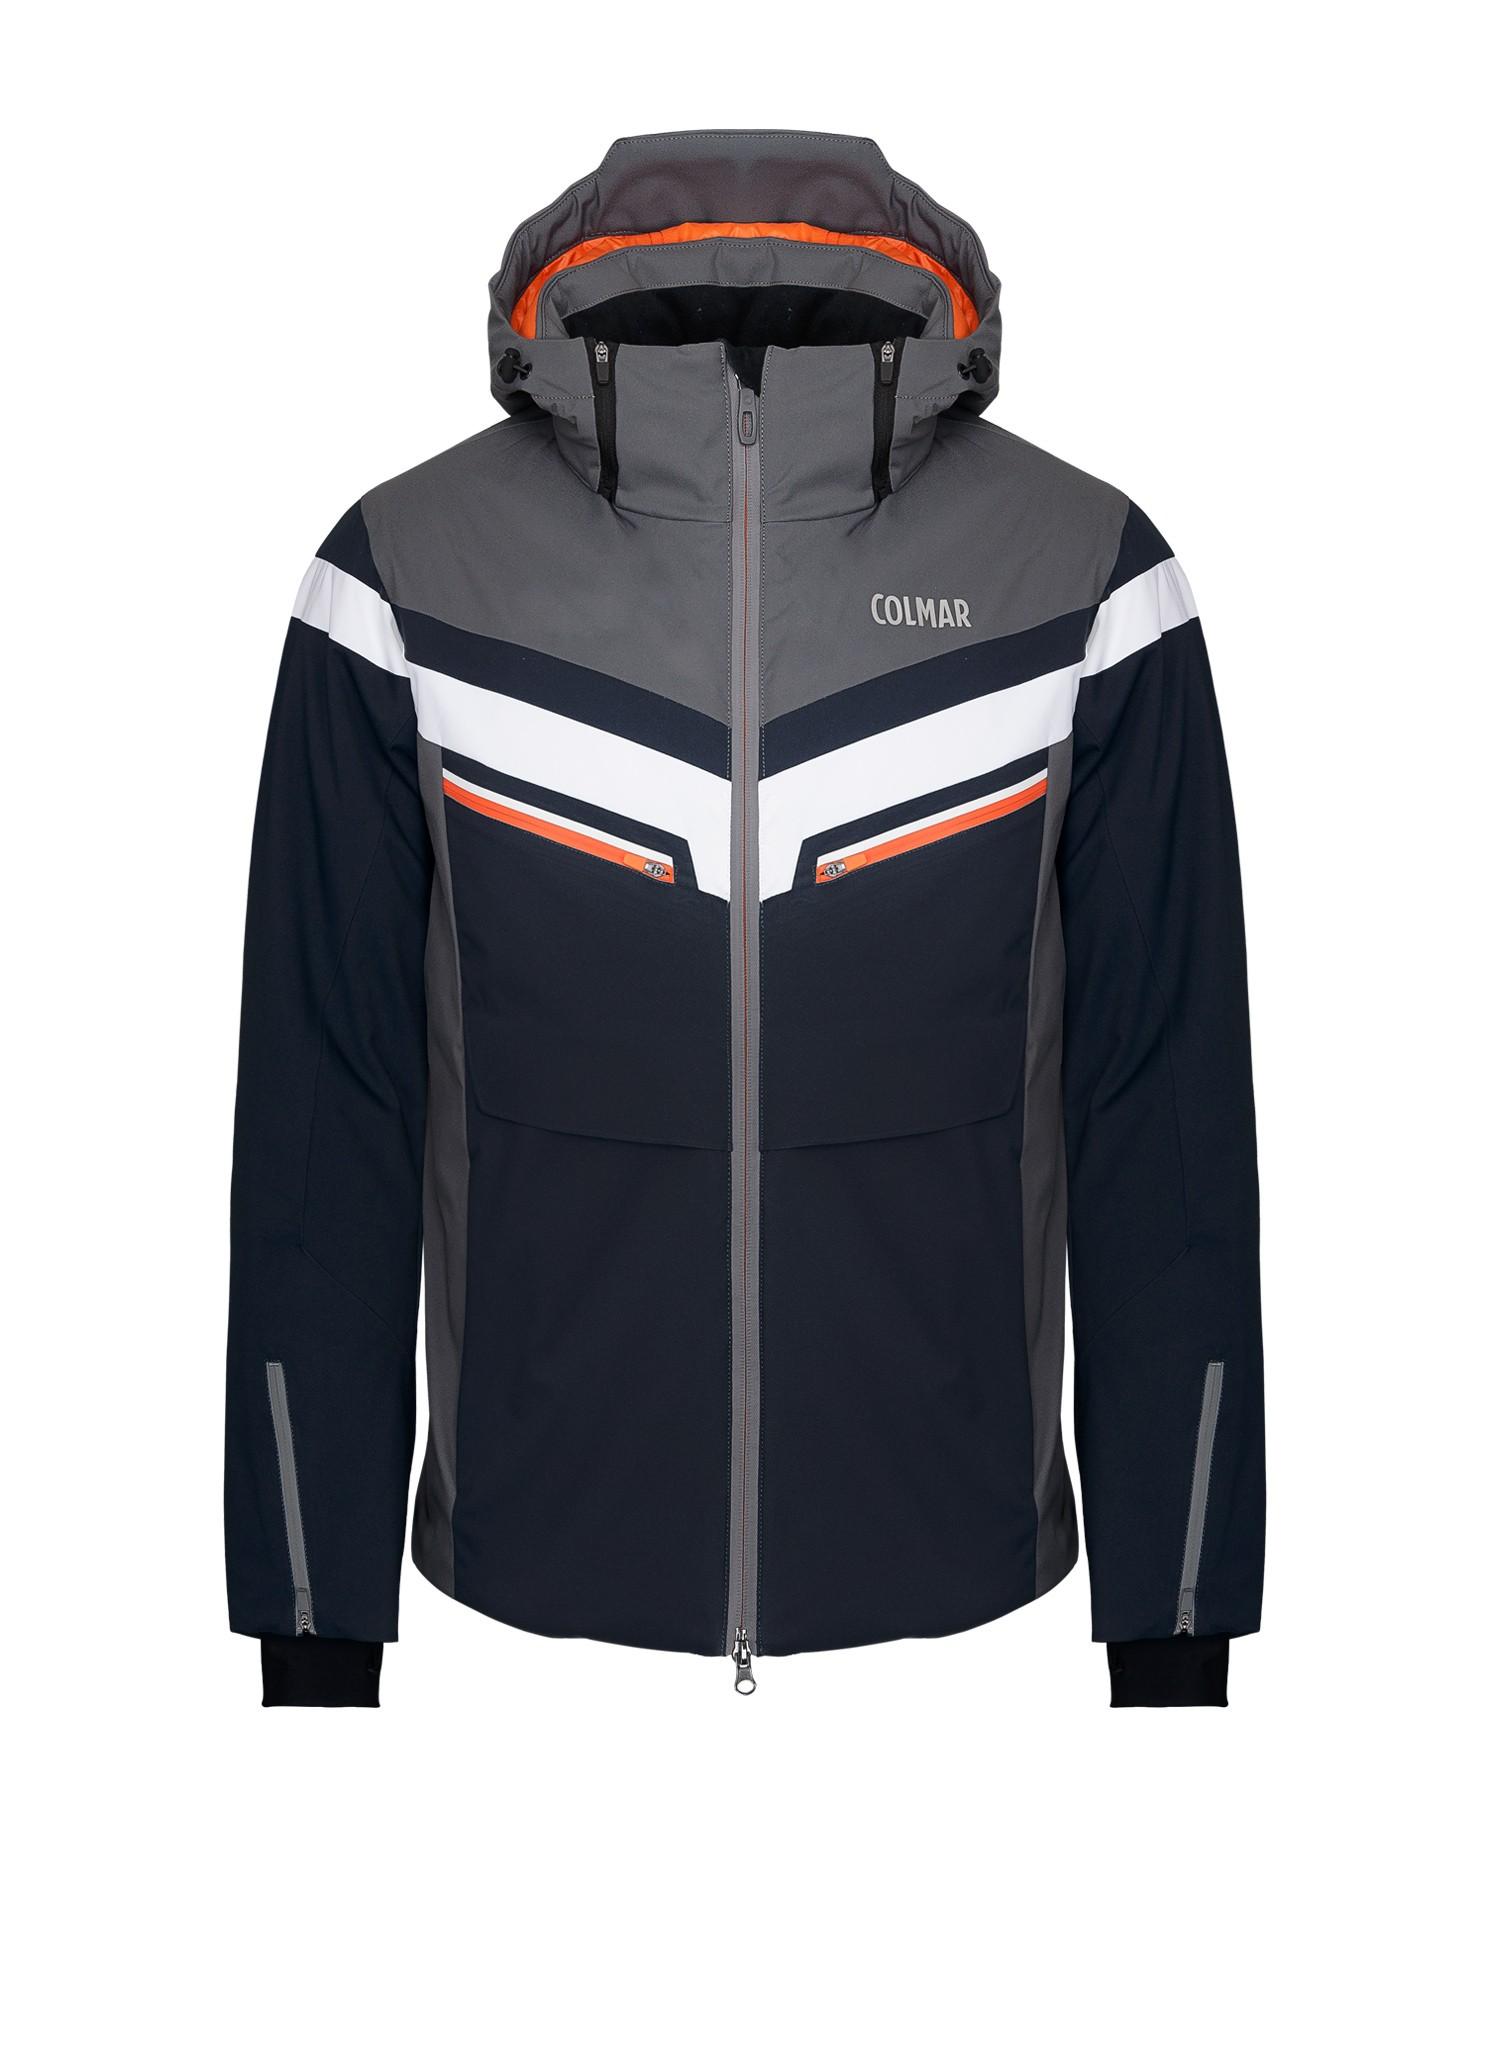 Giacca Eagle online sci Colmar Simone Sport Shop OE6dOq